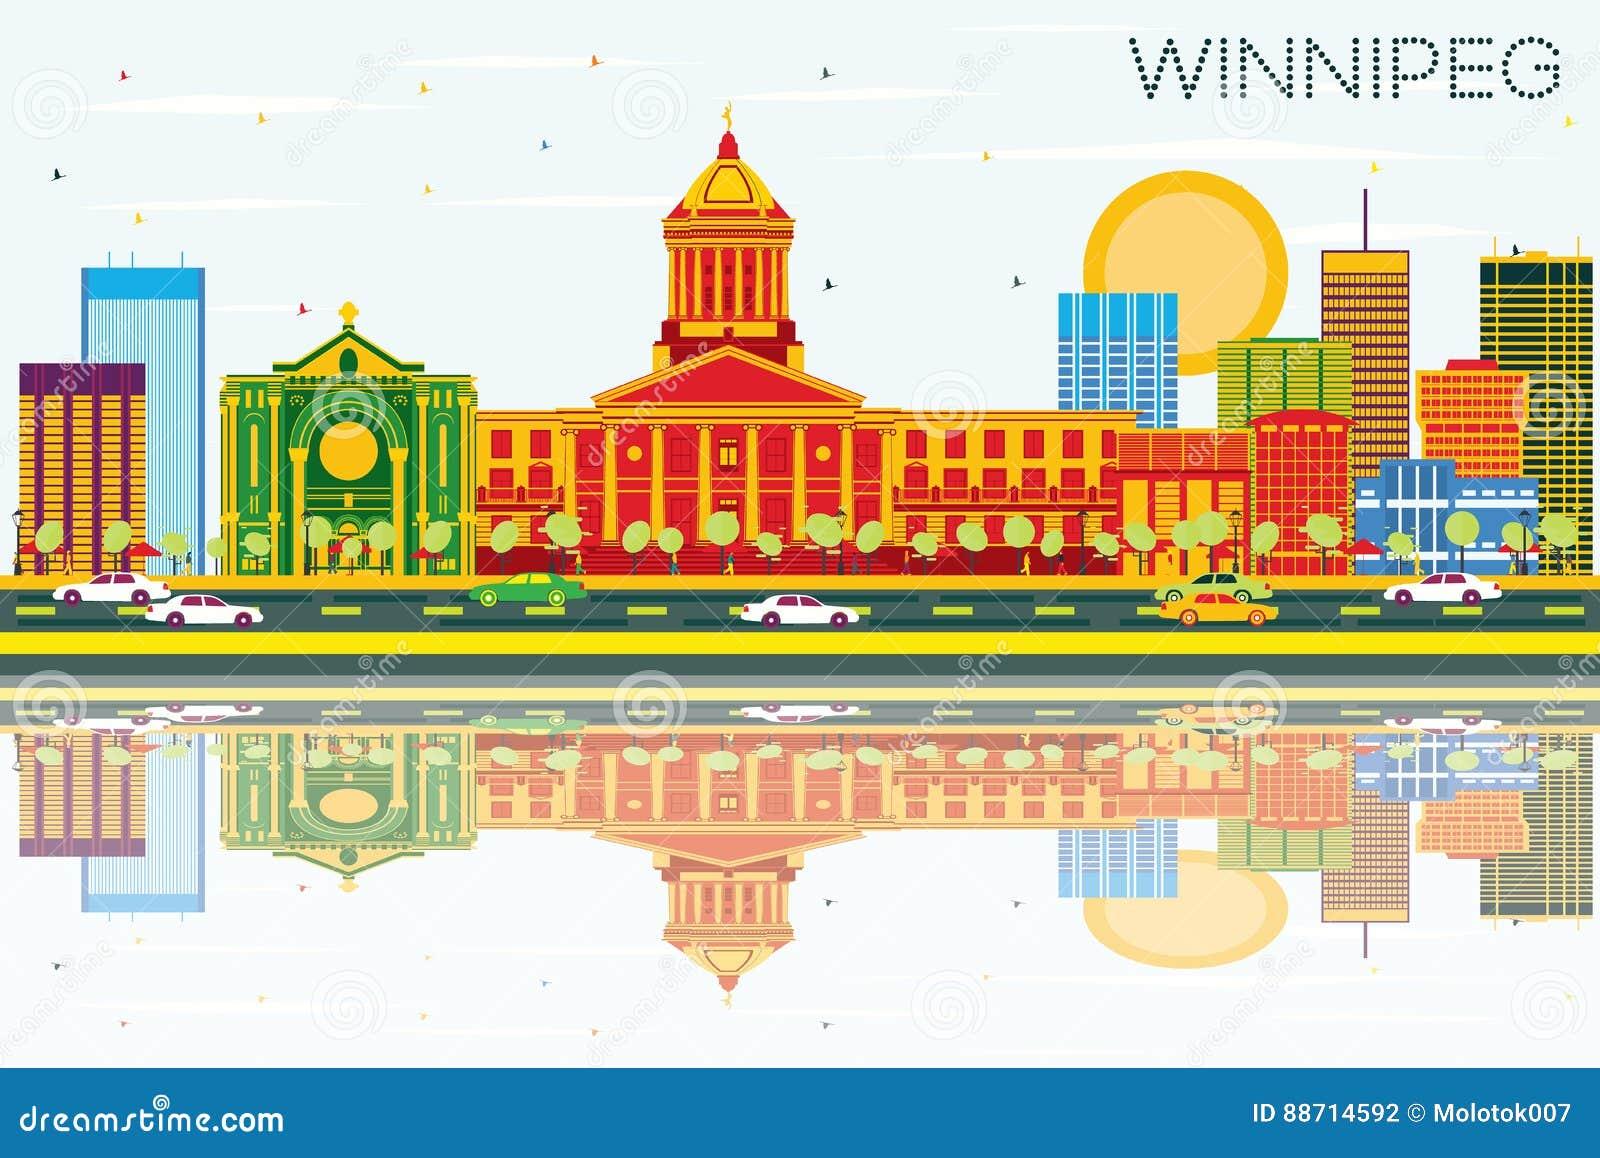 Winnipeg Skyline With Color Buildings, Blue Sky And